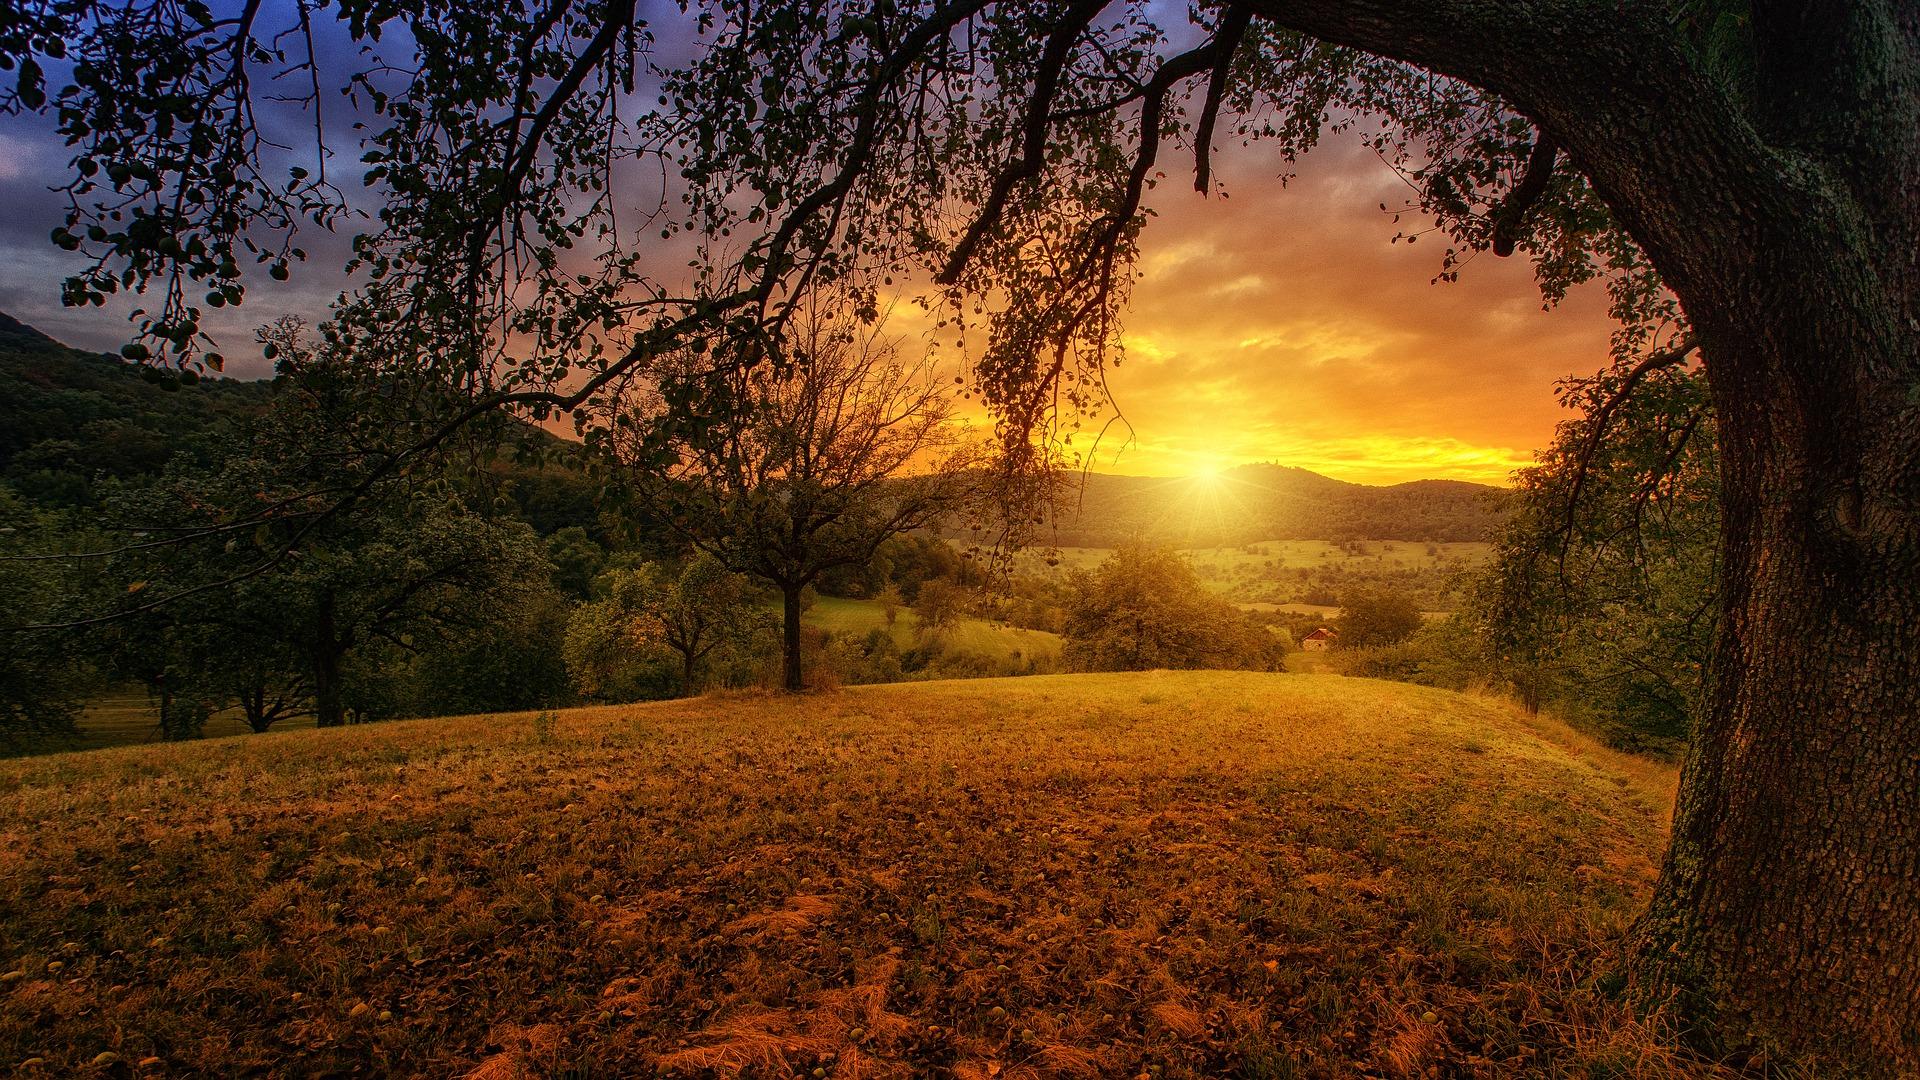 nature-Fatherheart - France